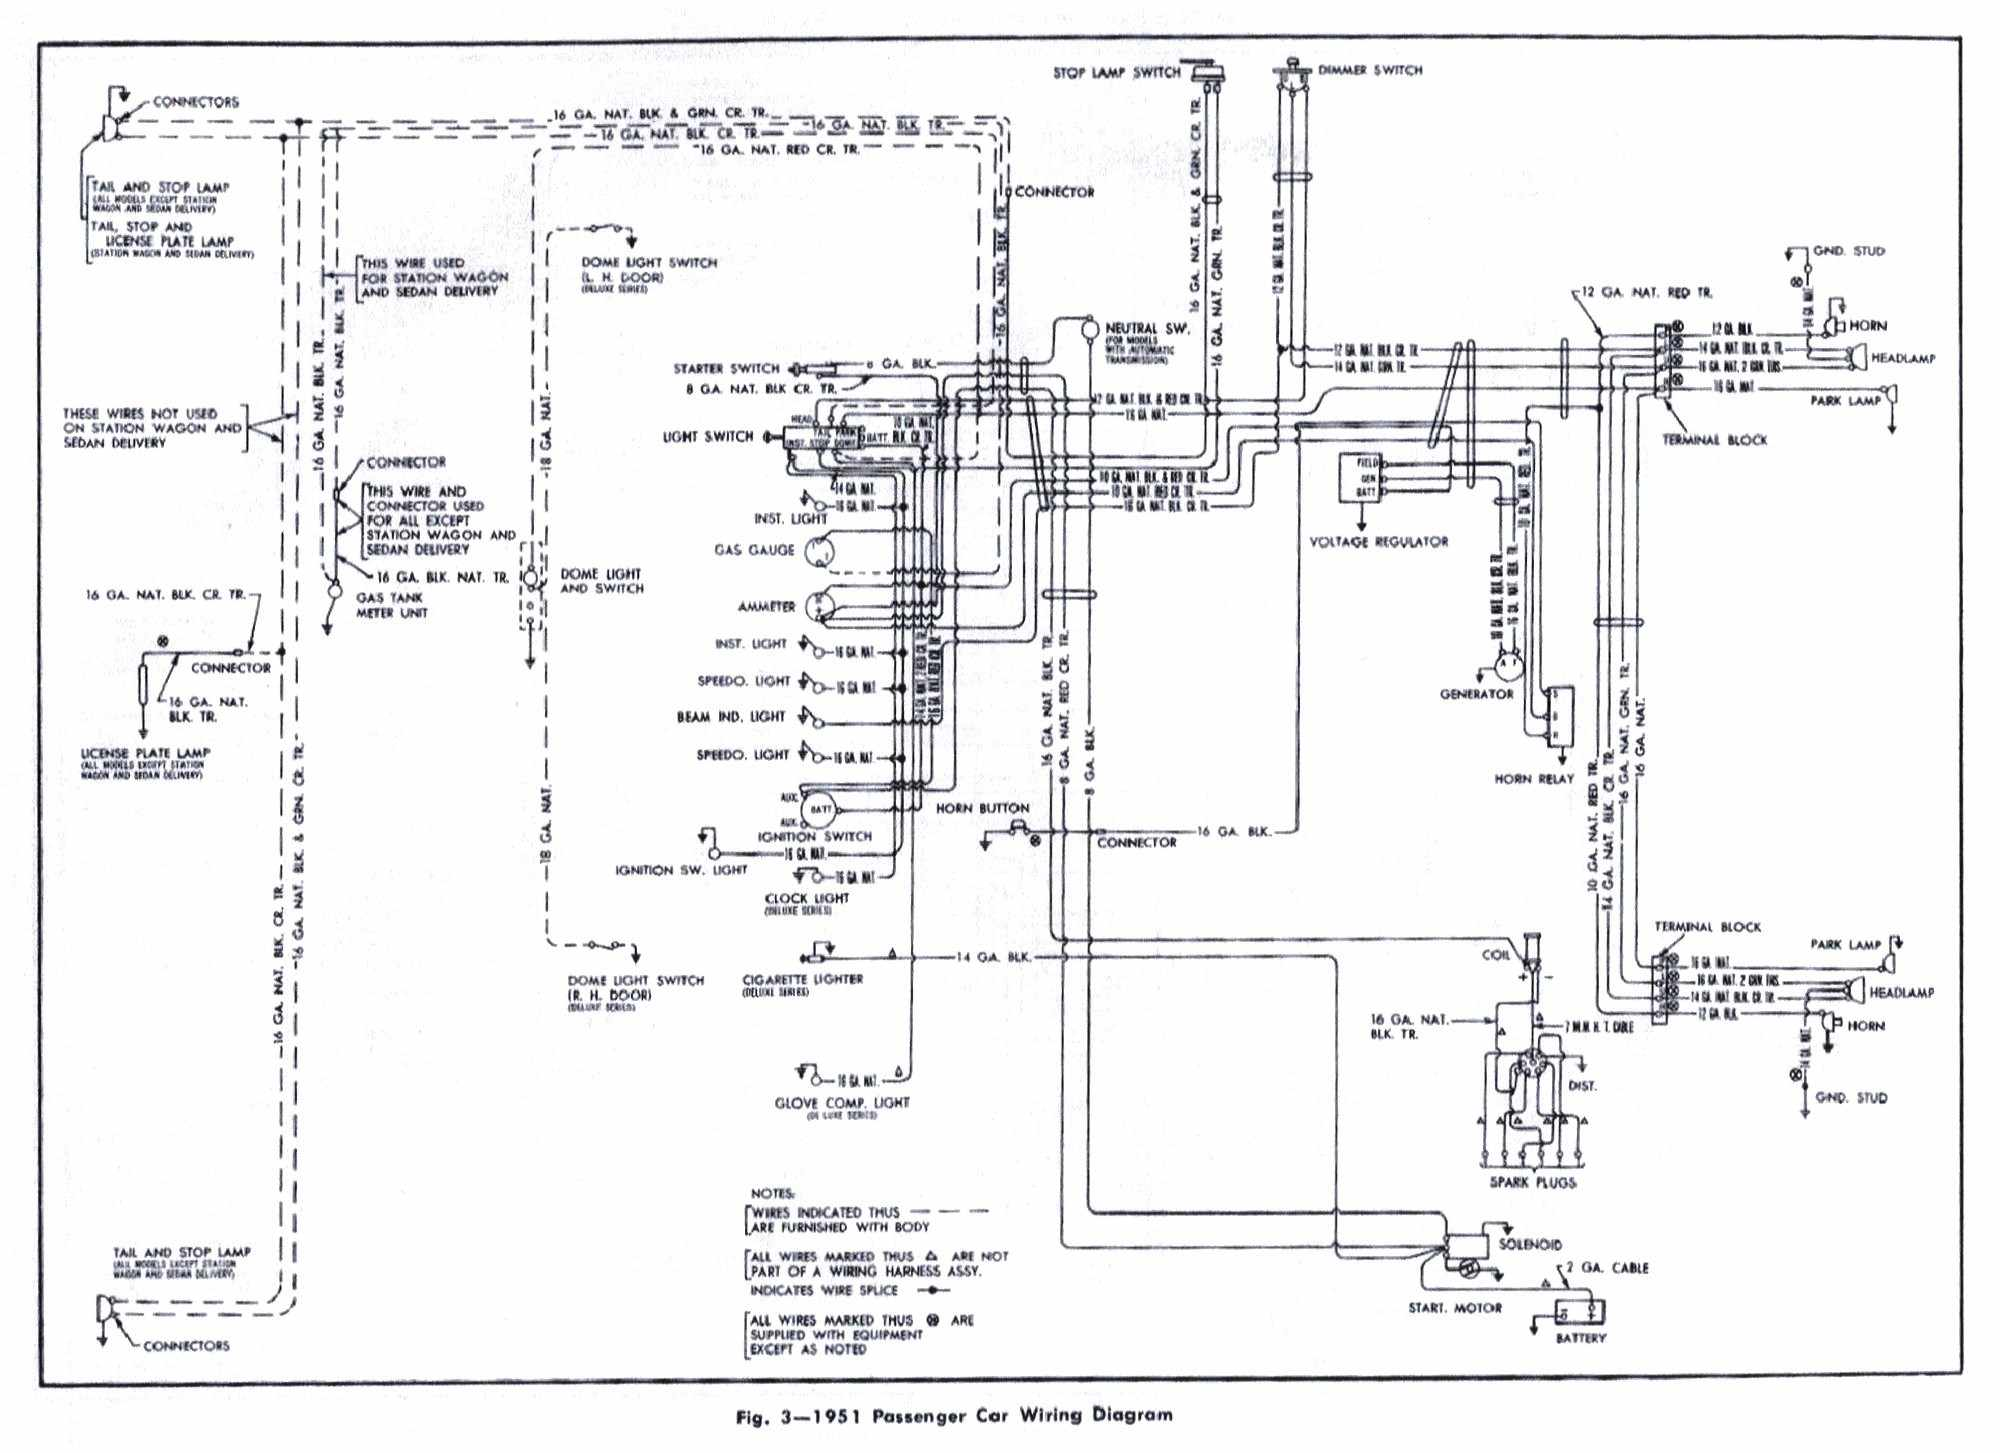 Electrical Diagram 1978 Dodge Power Wagon Start Building A Wiring For 1980 Club Car Diagrams App Auto Rh Stanford Edu Uk Co Gov Hardtobelieve Me 1974